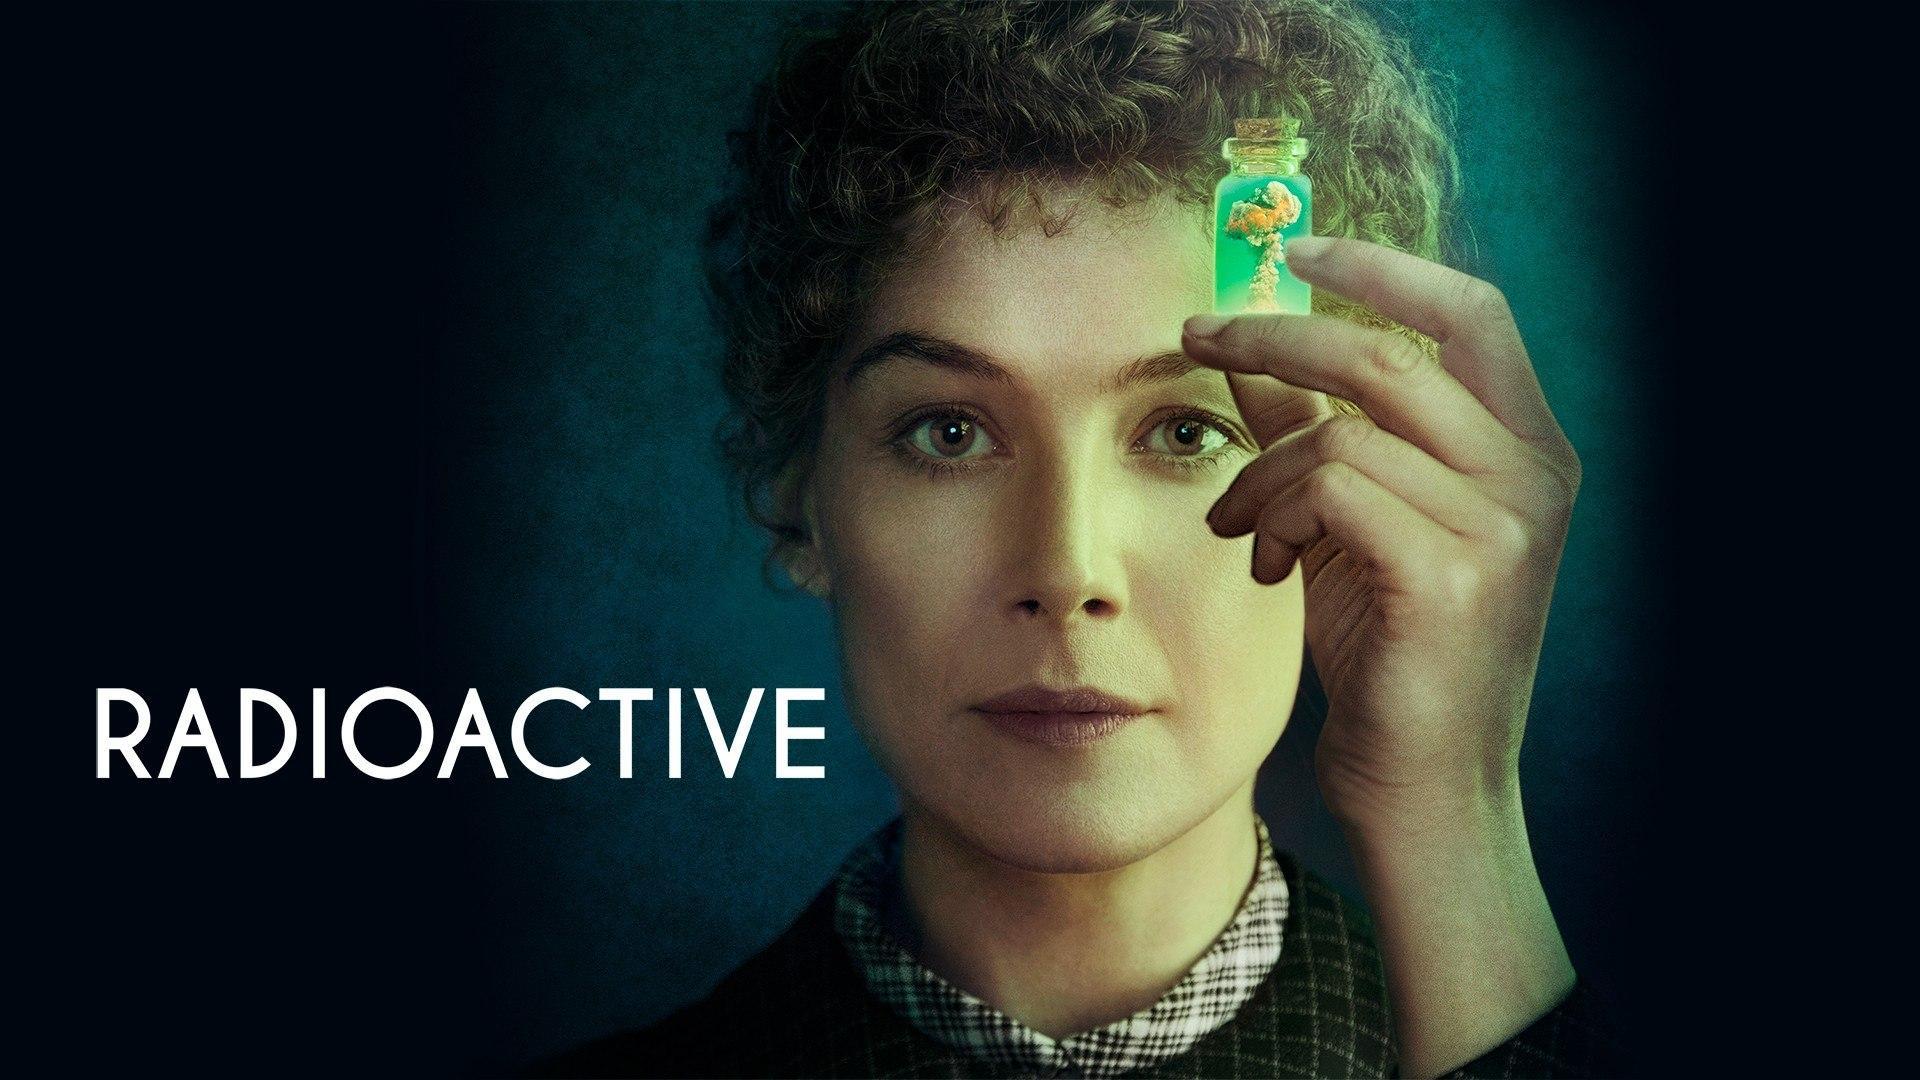 Martedi 5 Gennaio 2021 Sky e Premium Cinema, Radioactive